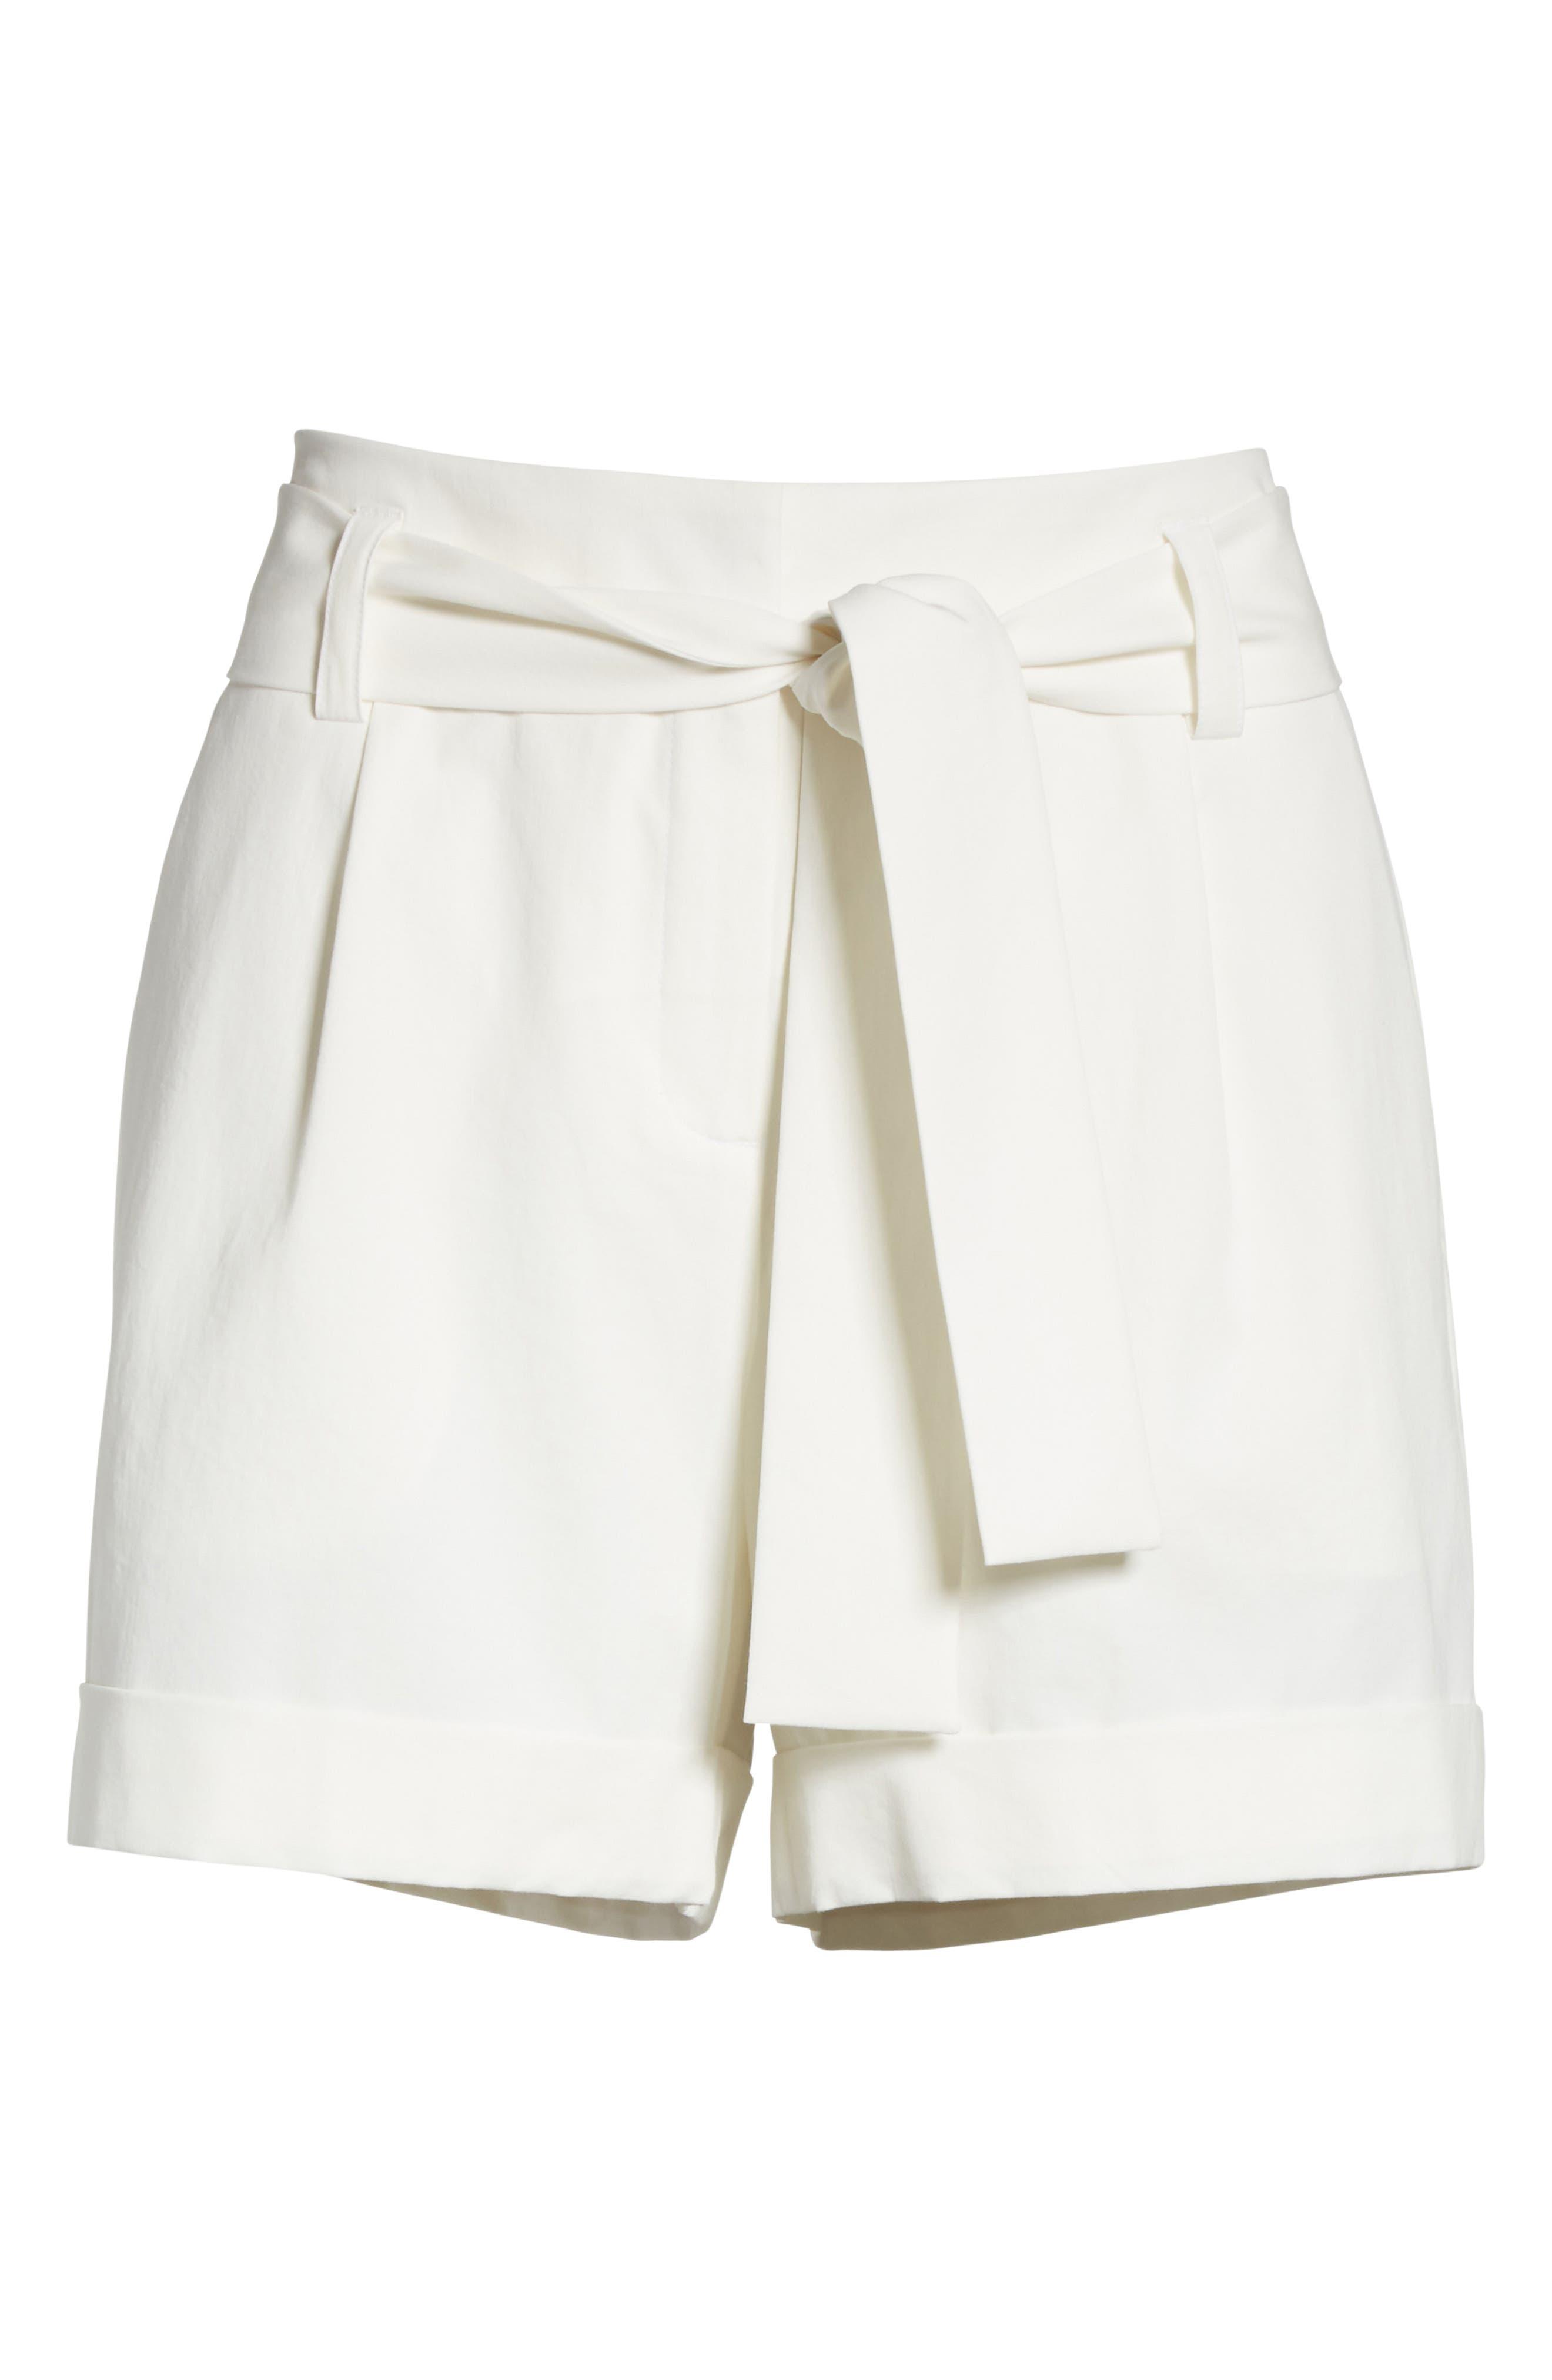 Greenpoint City Shorts,                             Alternate thumbnail 7, color,                             White